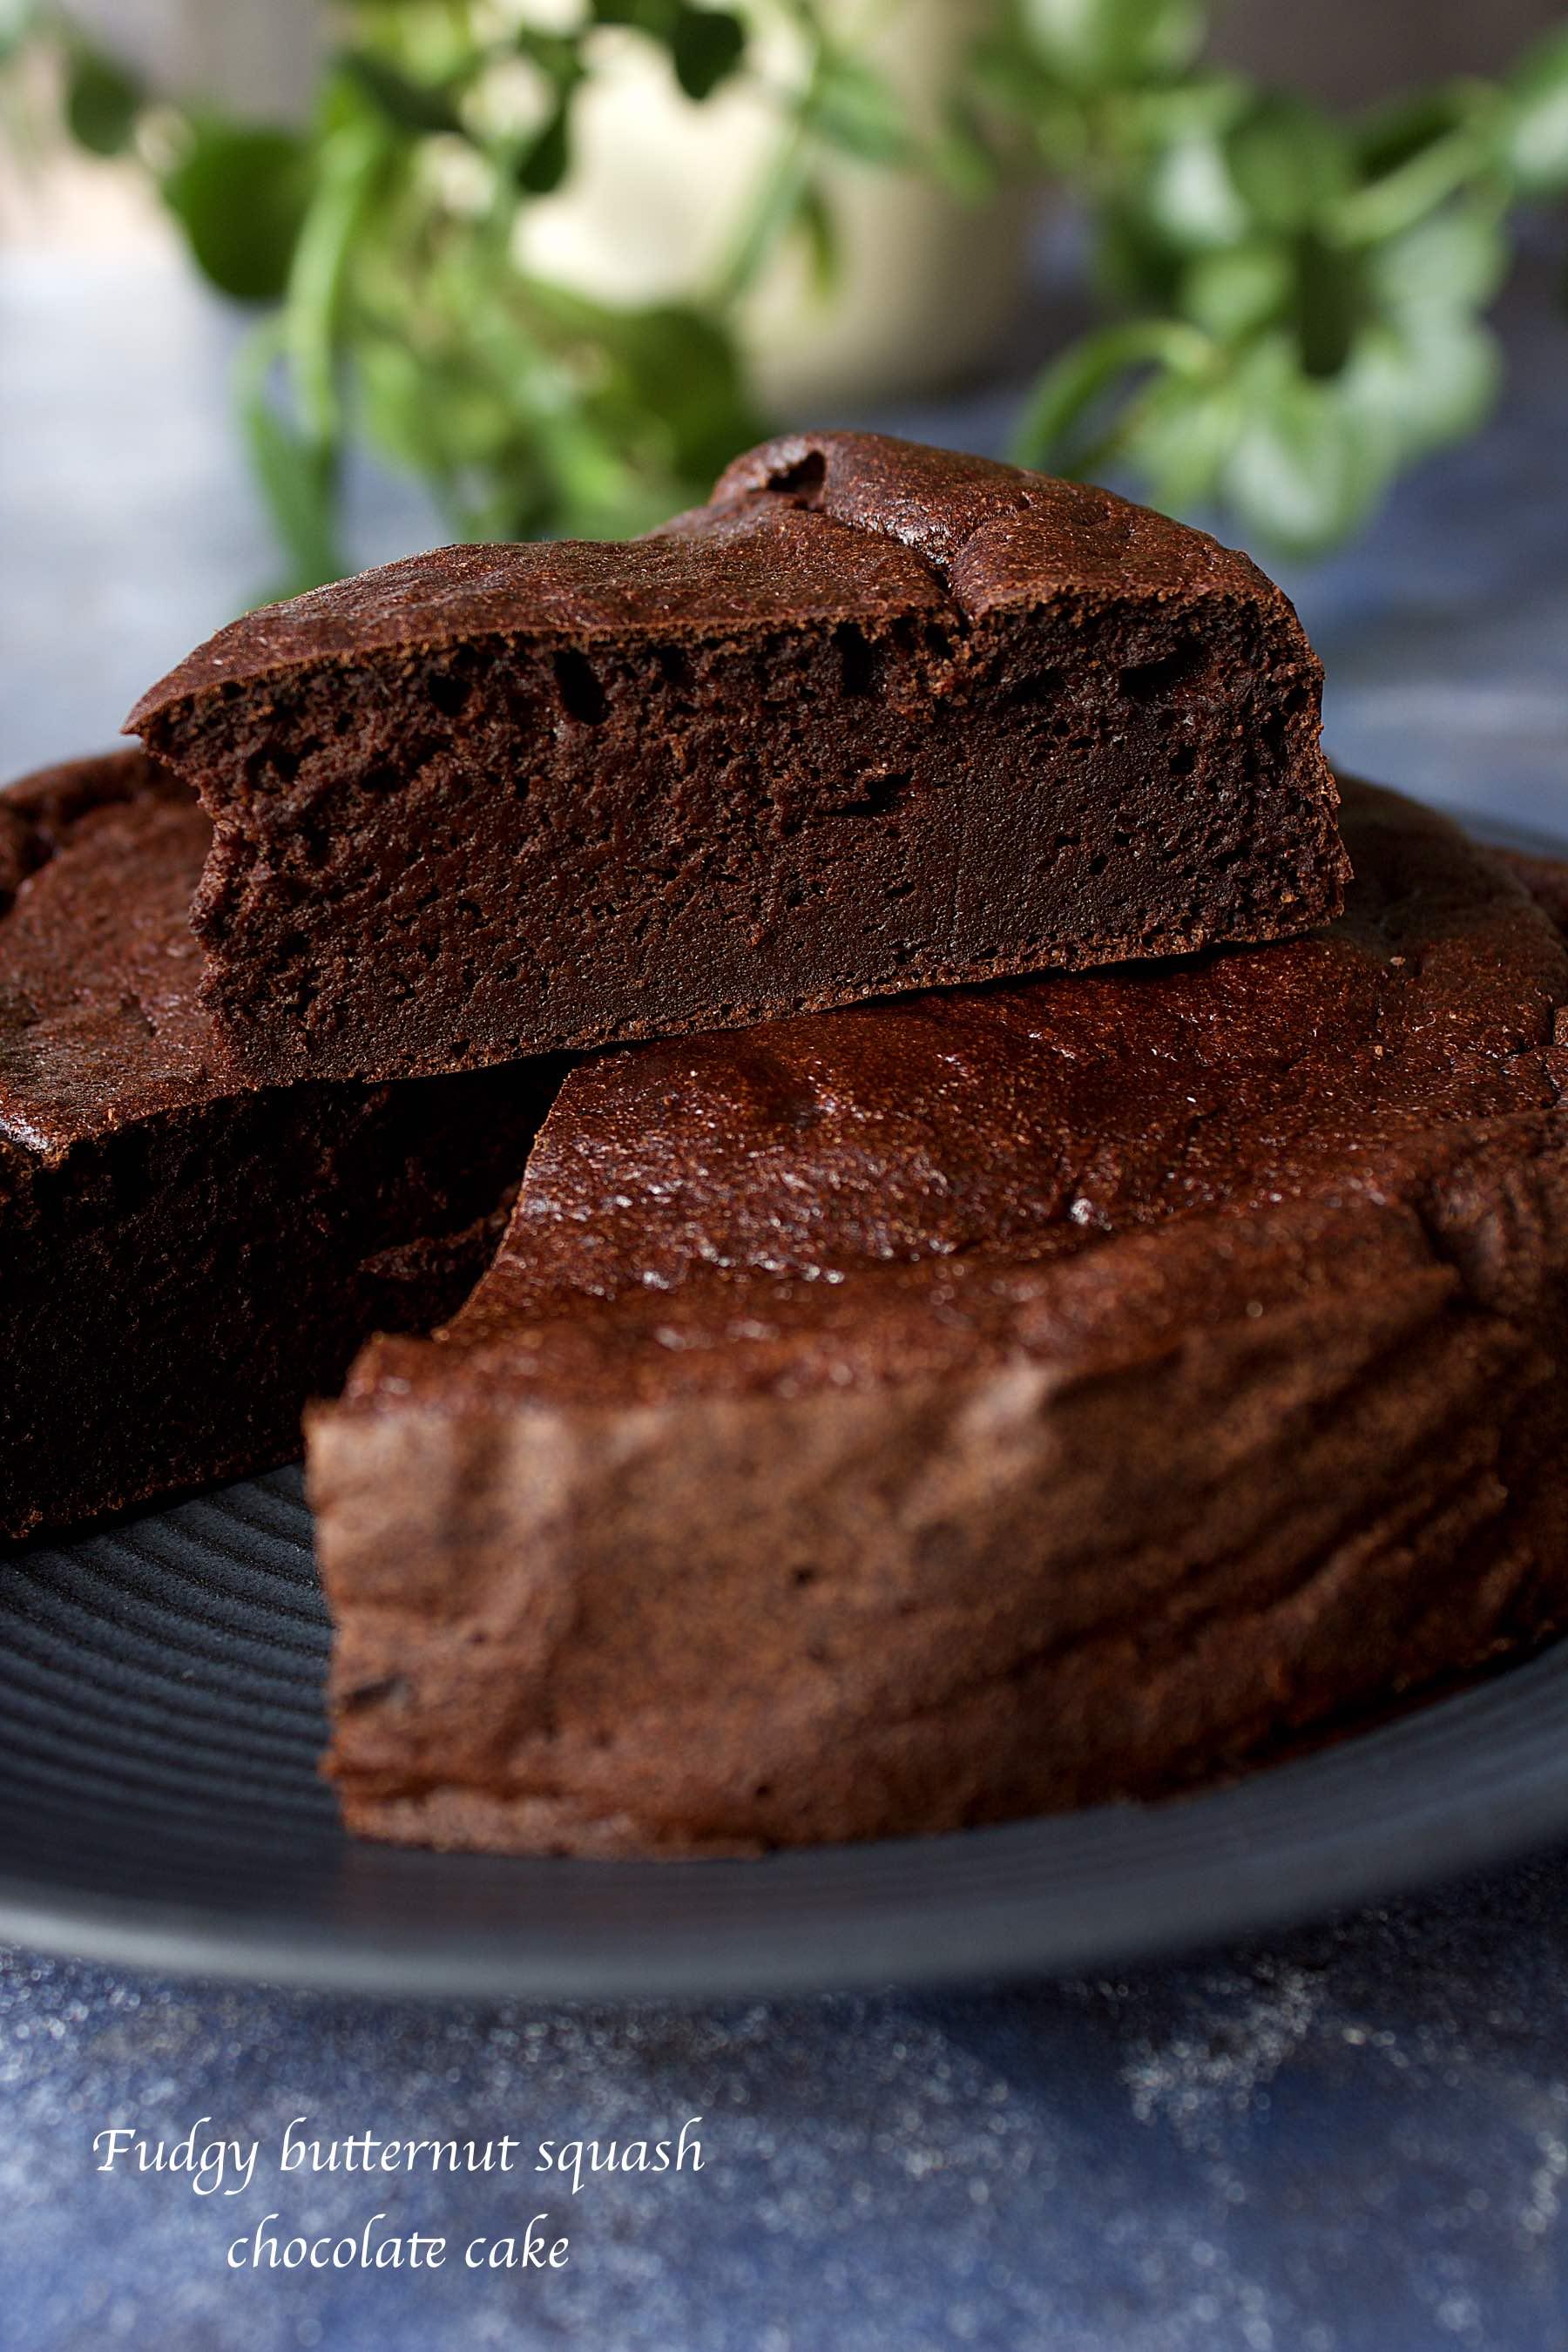 Fudgy butternut squash chocolate cake